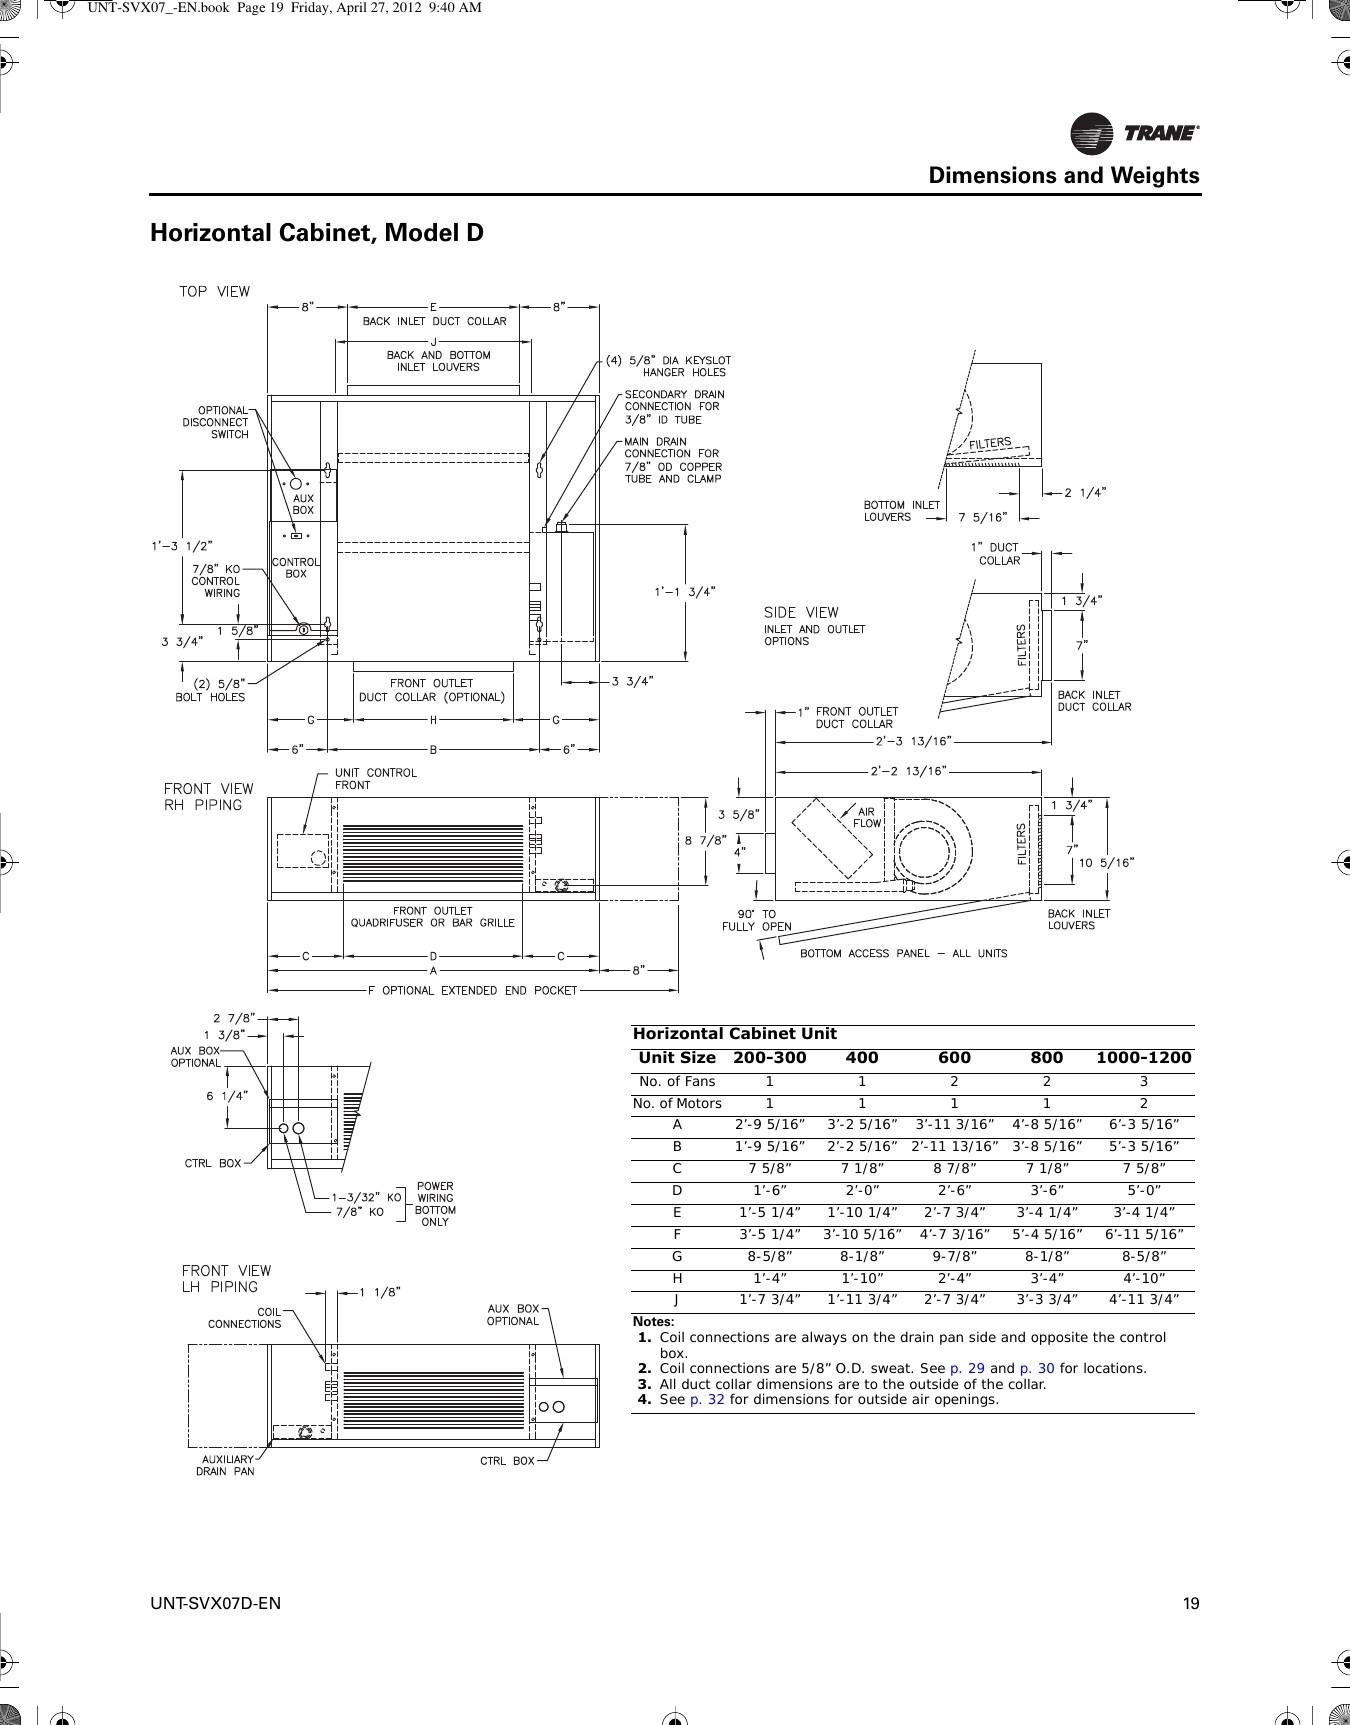 d1s hid wiring diagram free download image wiring diagram